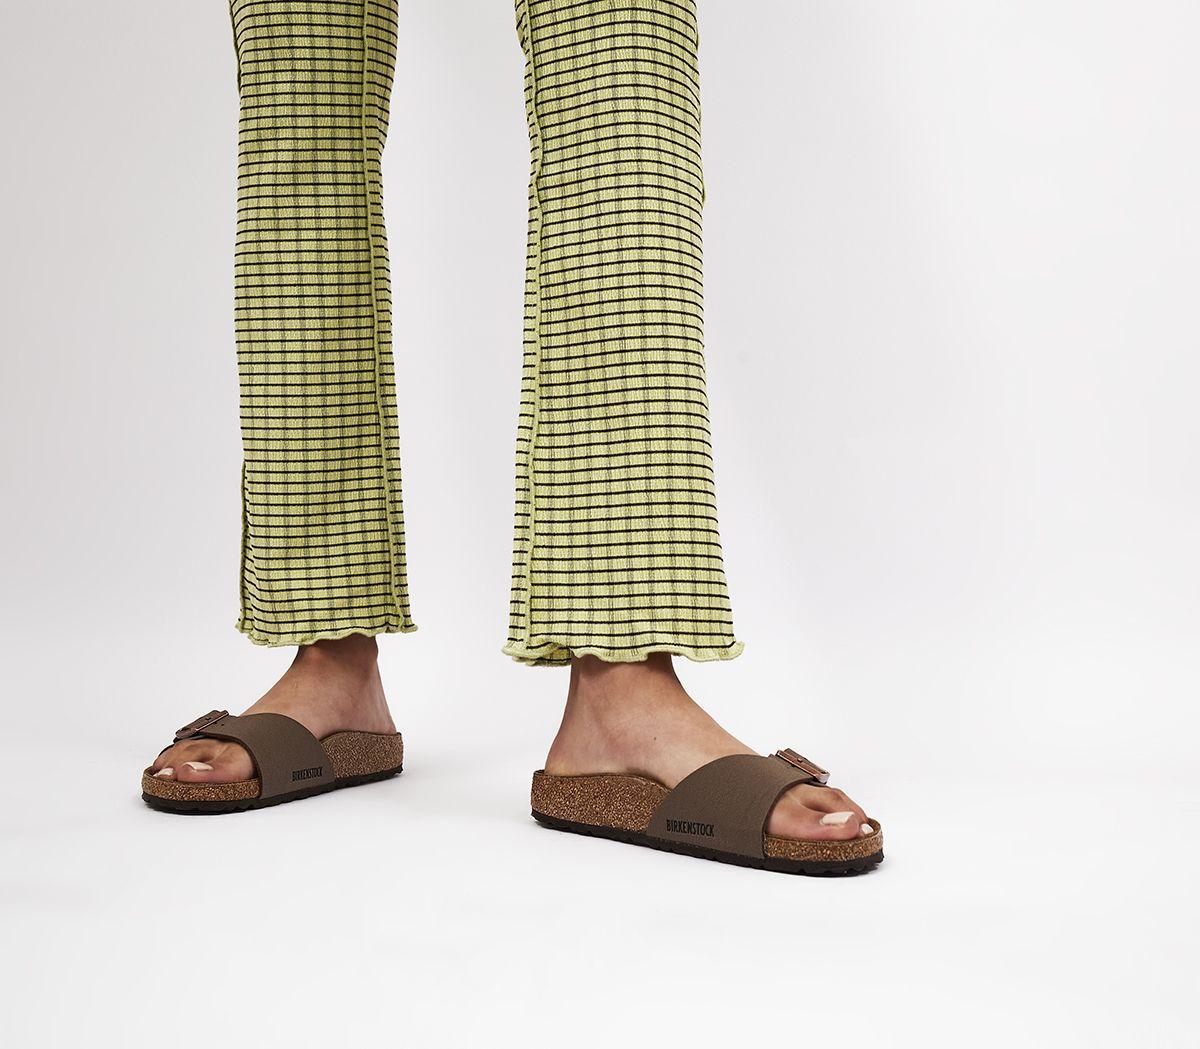 f13ad050461 Birkenstock Madrid 1 Bar Mules Mocha - Sandals